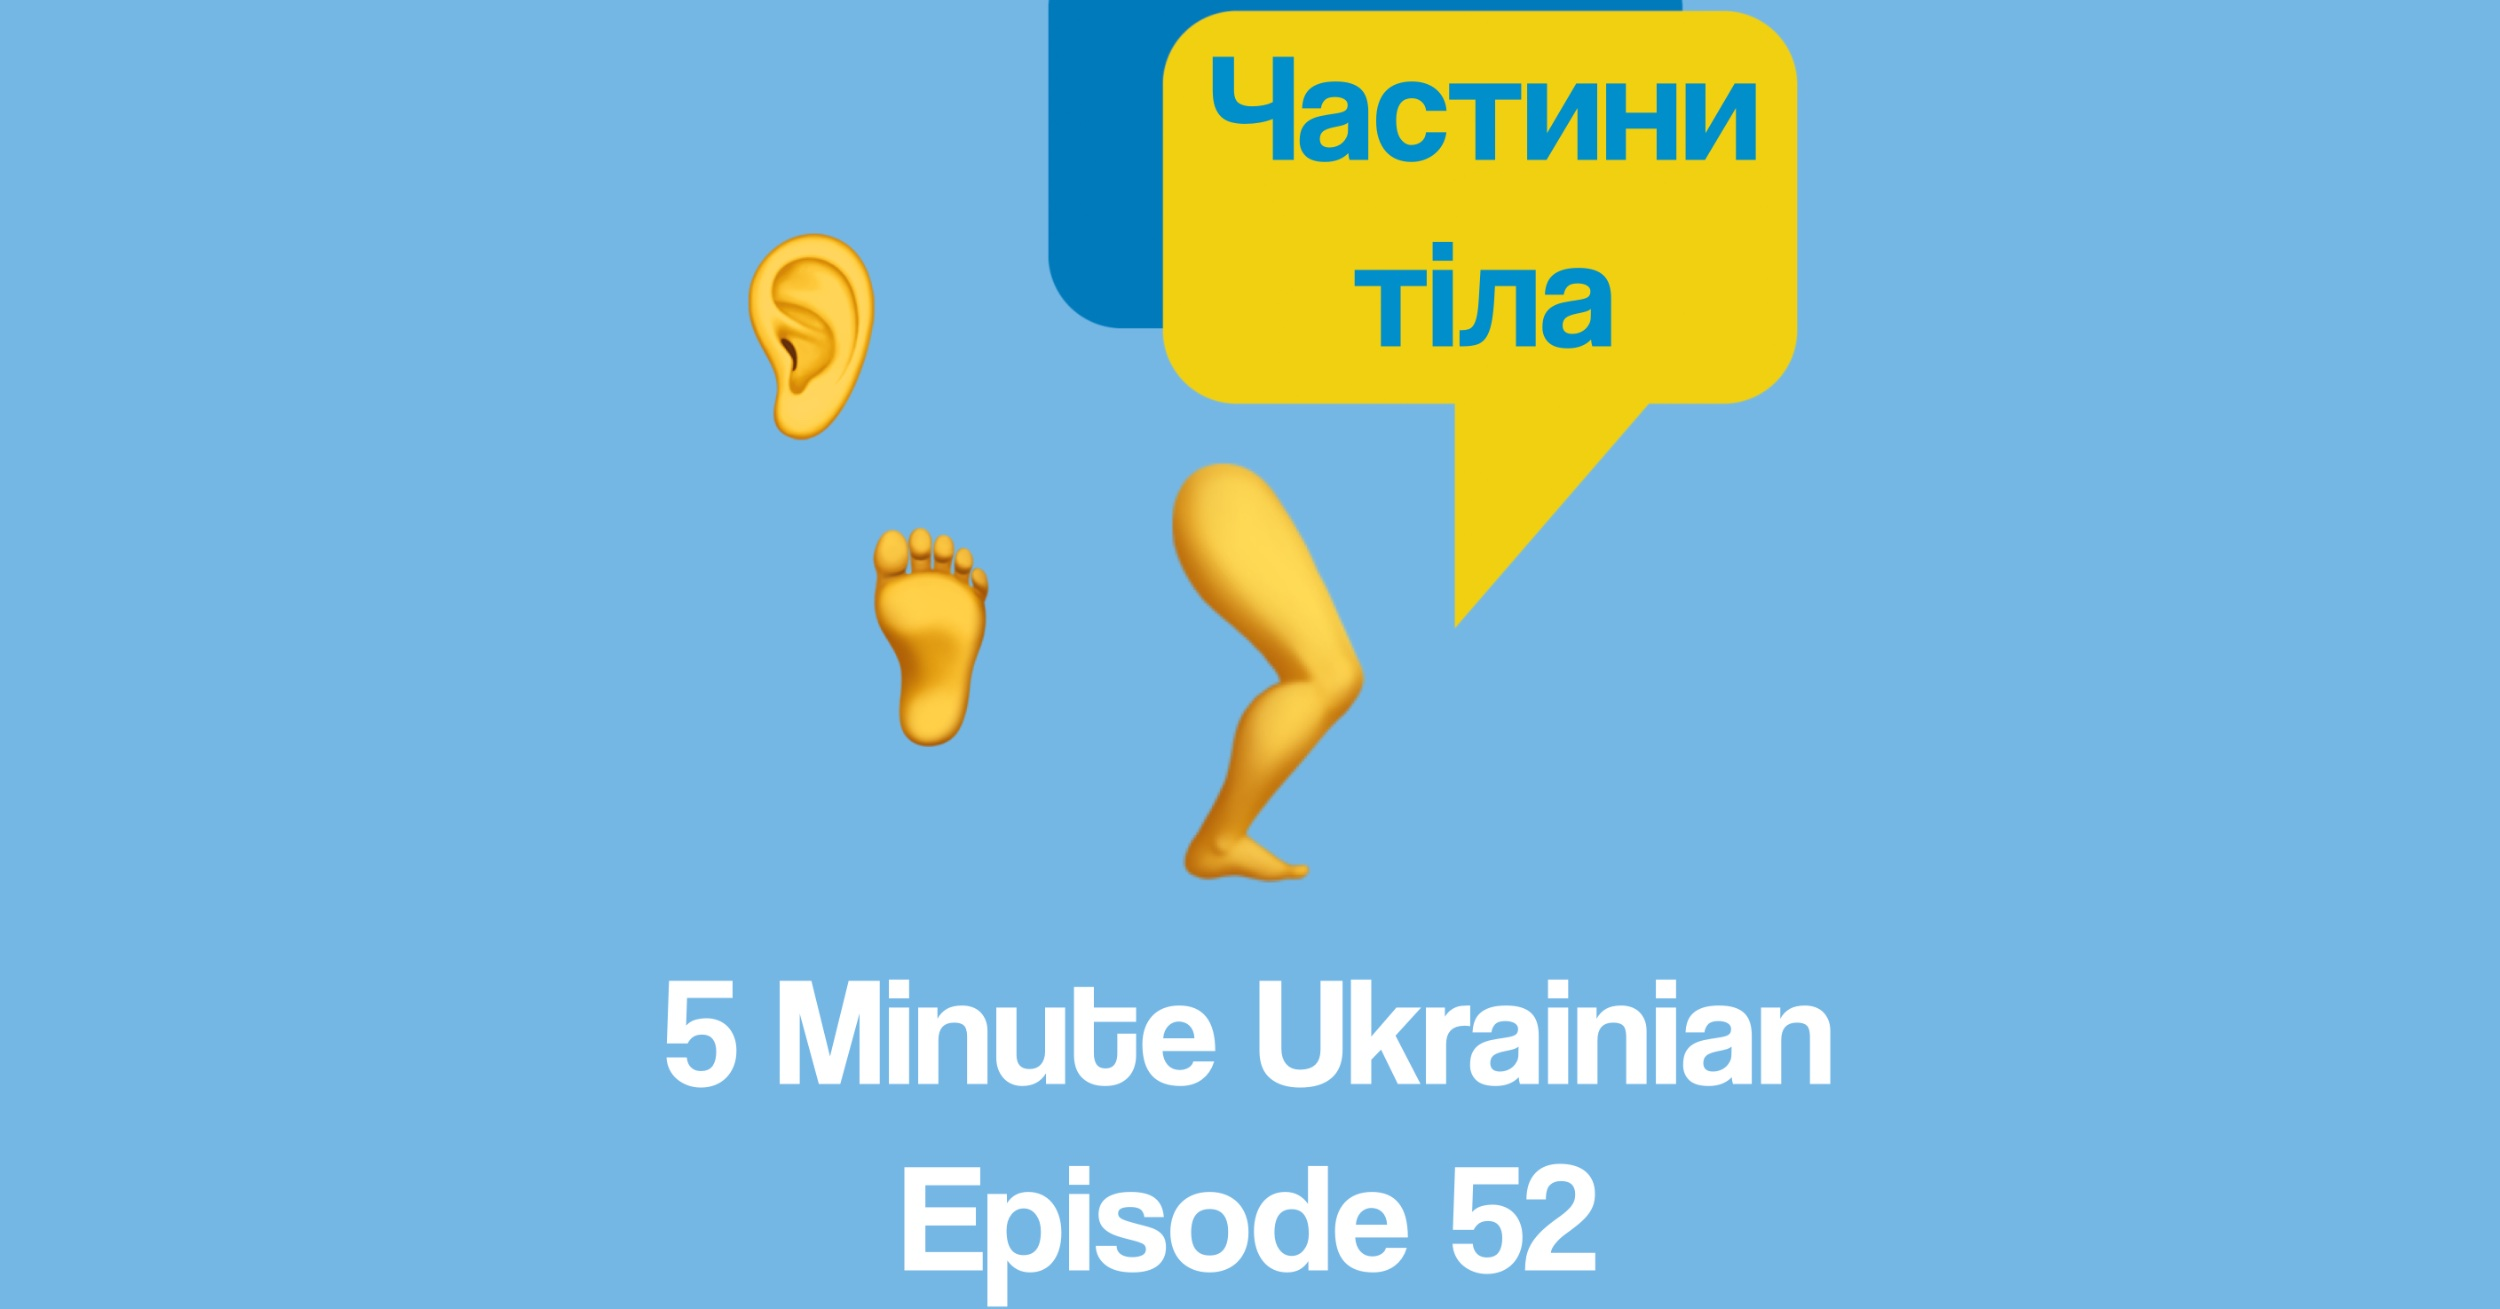 body parts in Ukrainian